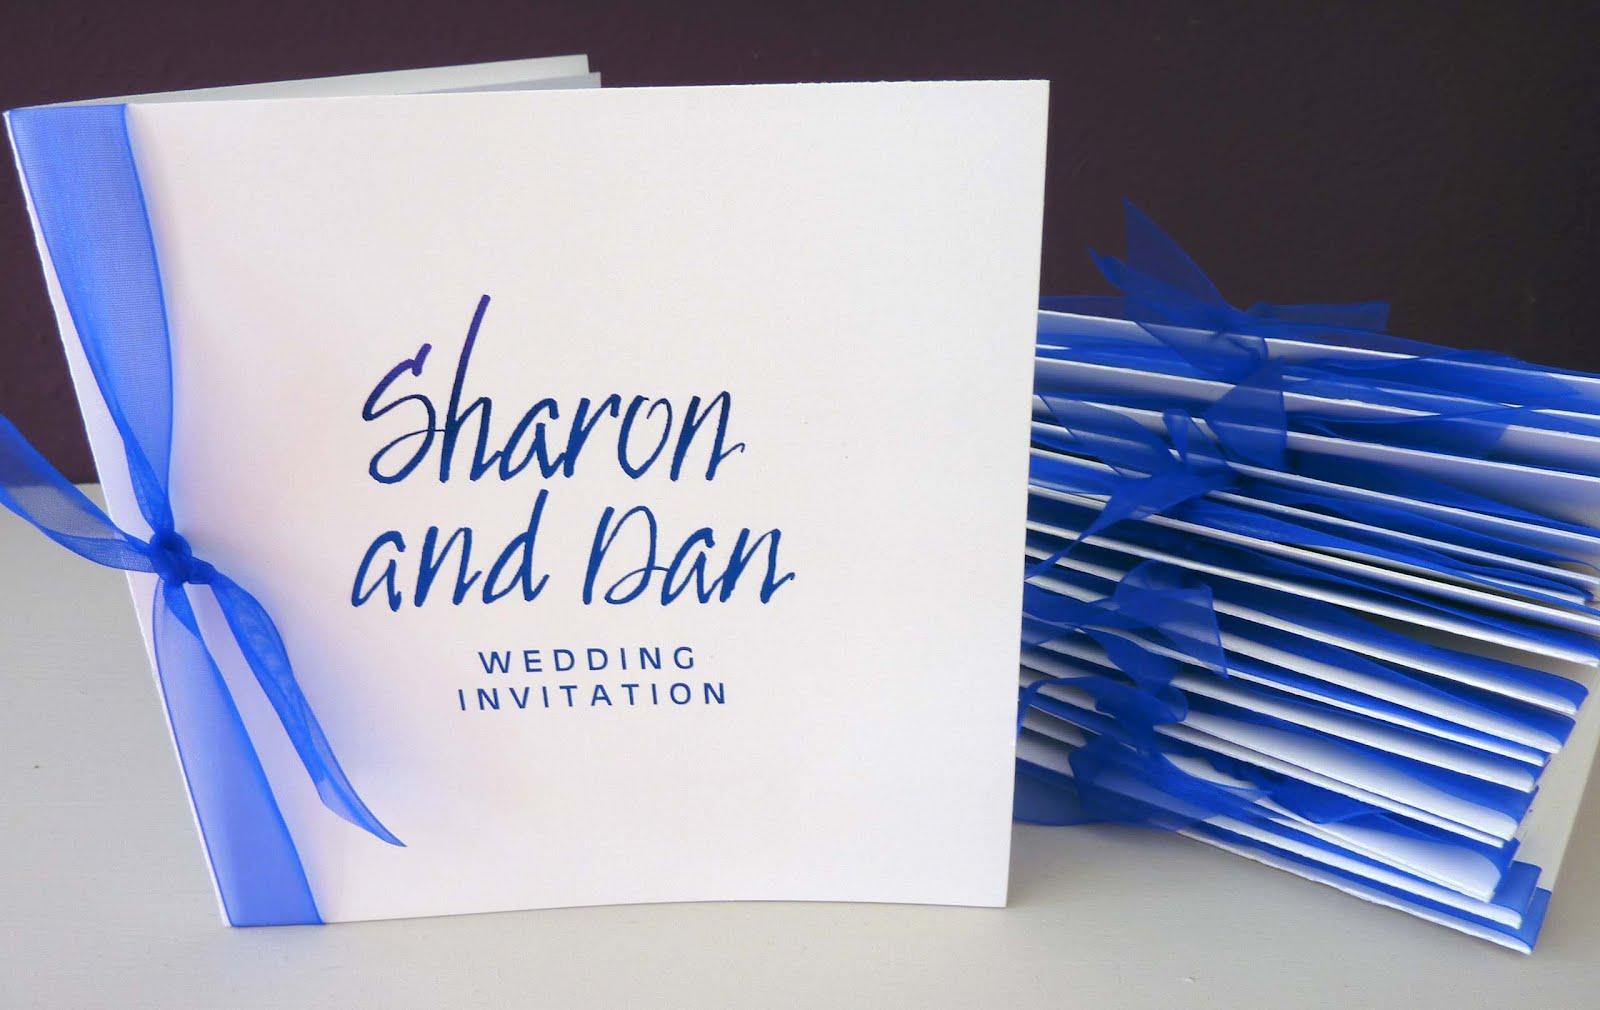 Sharon And Dan Handmade Wedding Invitations